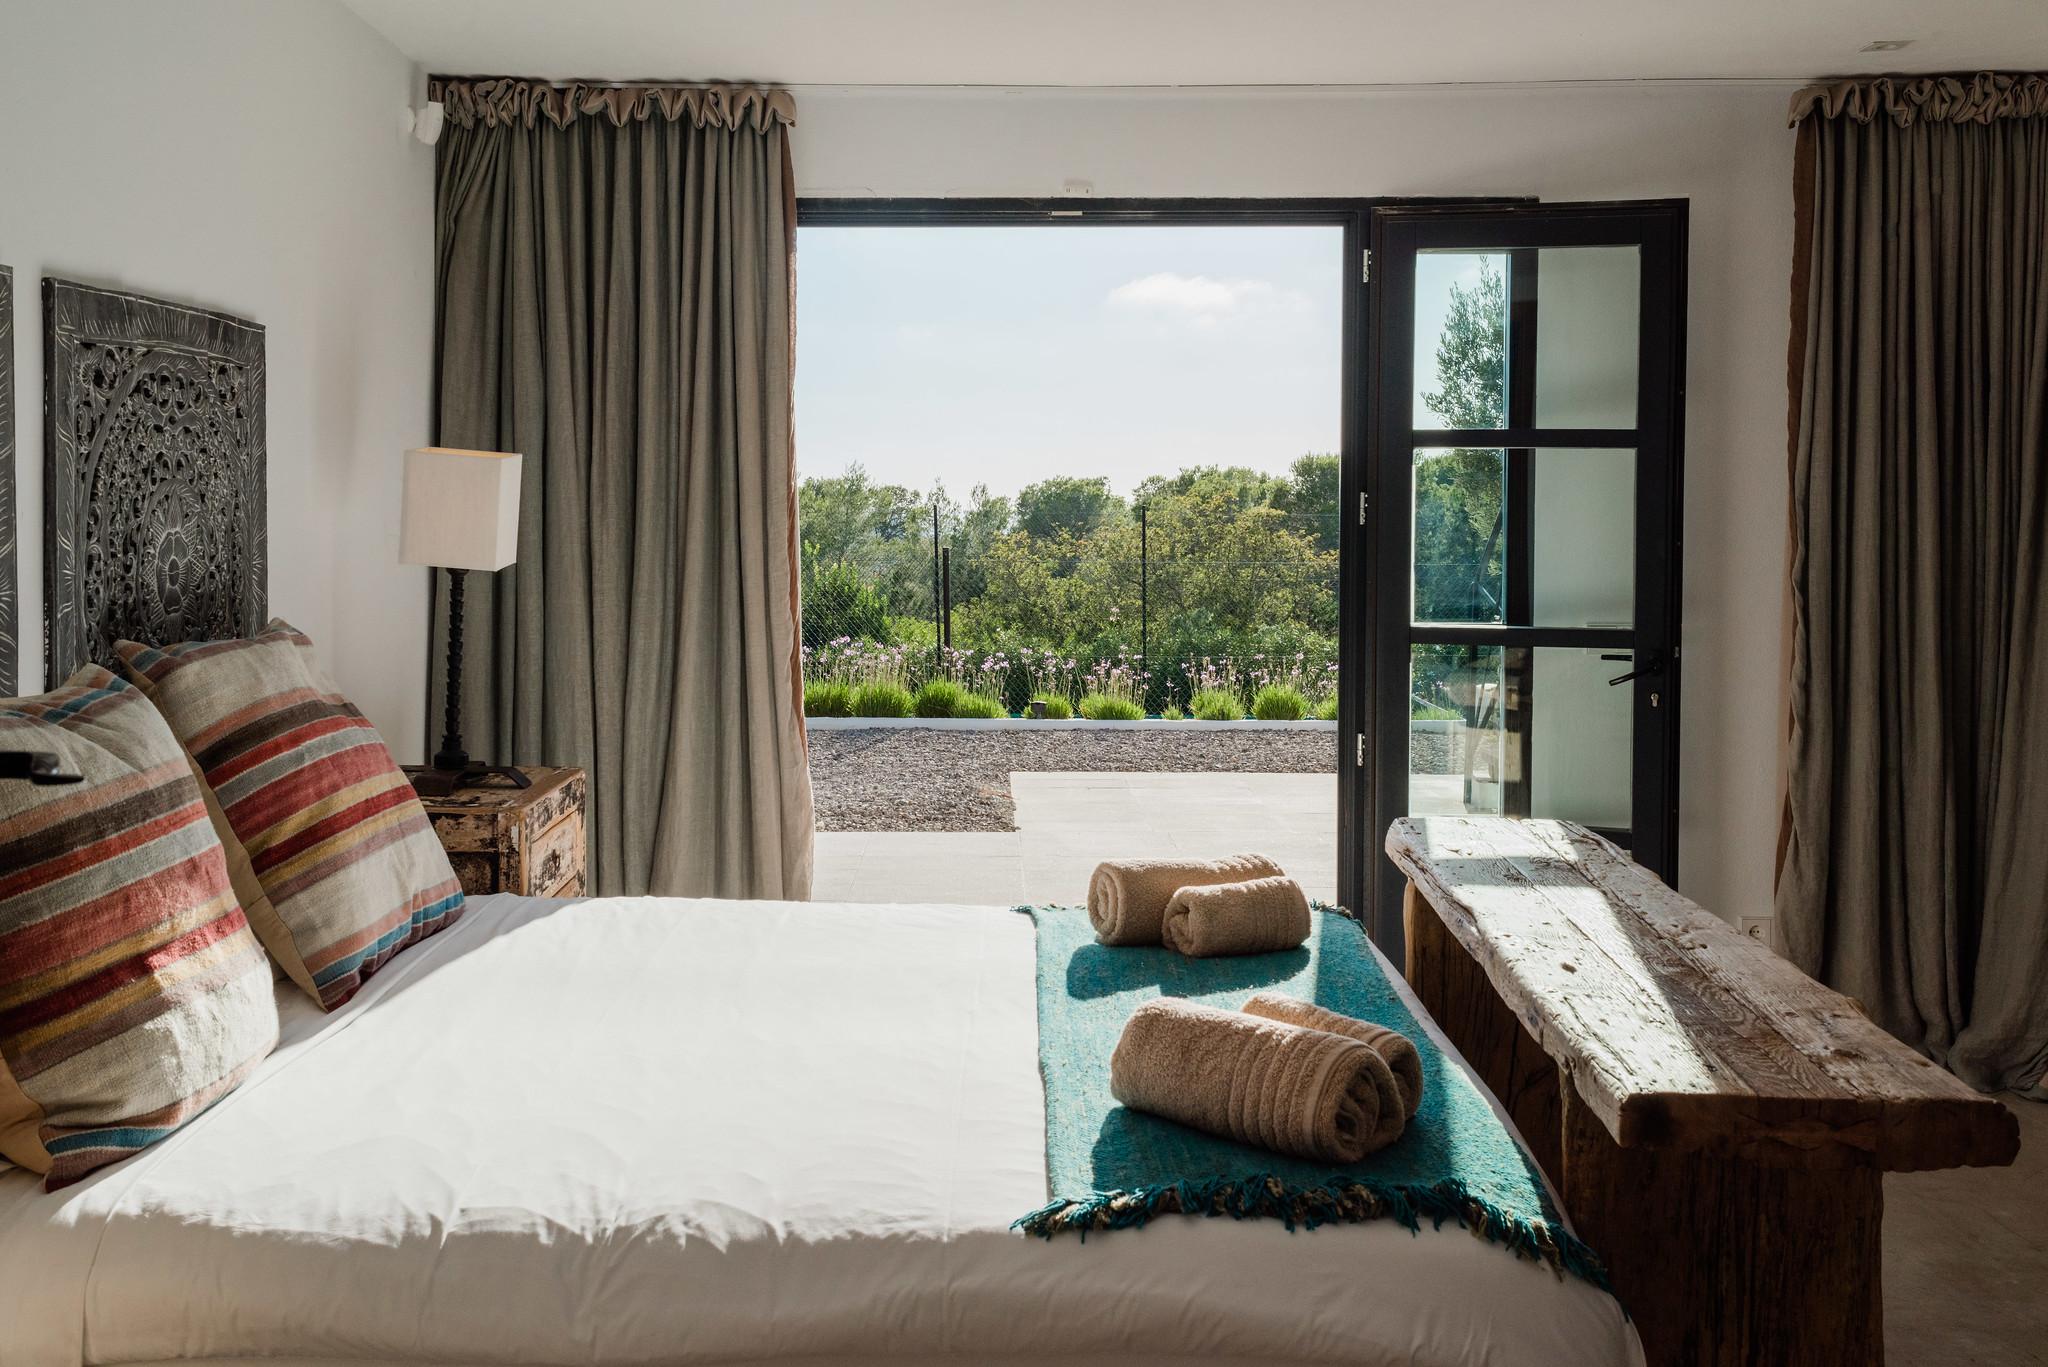 https://www.white-ibiza.com/wp-content/uploads/2020/05/white-ibiza-villas-casa-amalia-interior-bedroom4.jpg